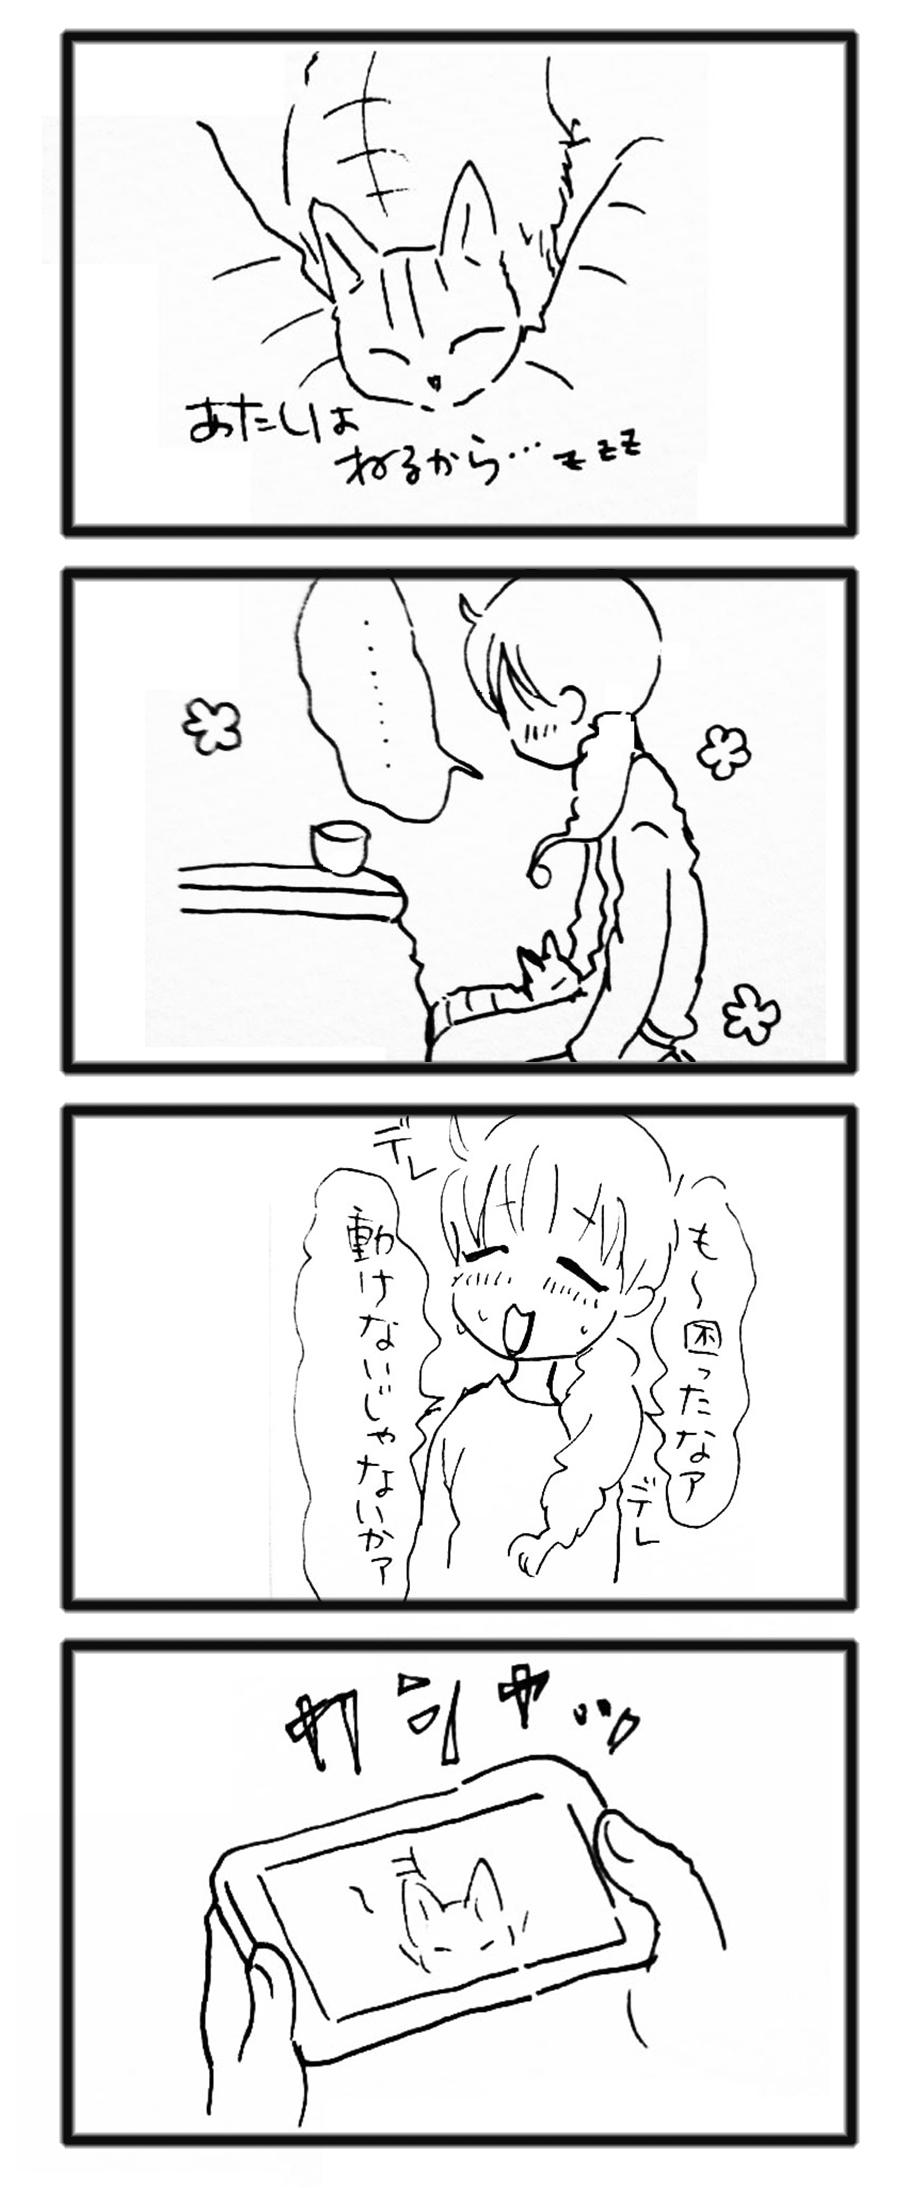 20130506_04